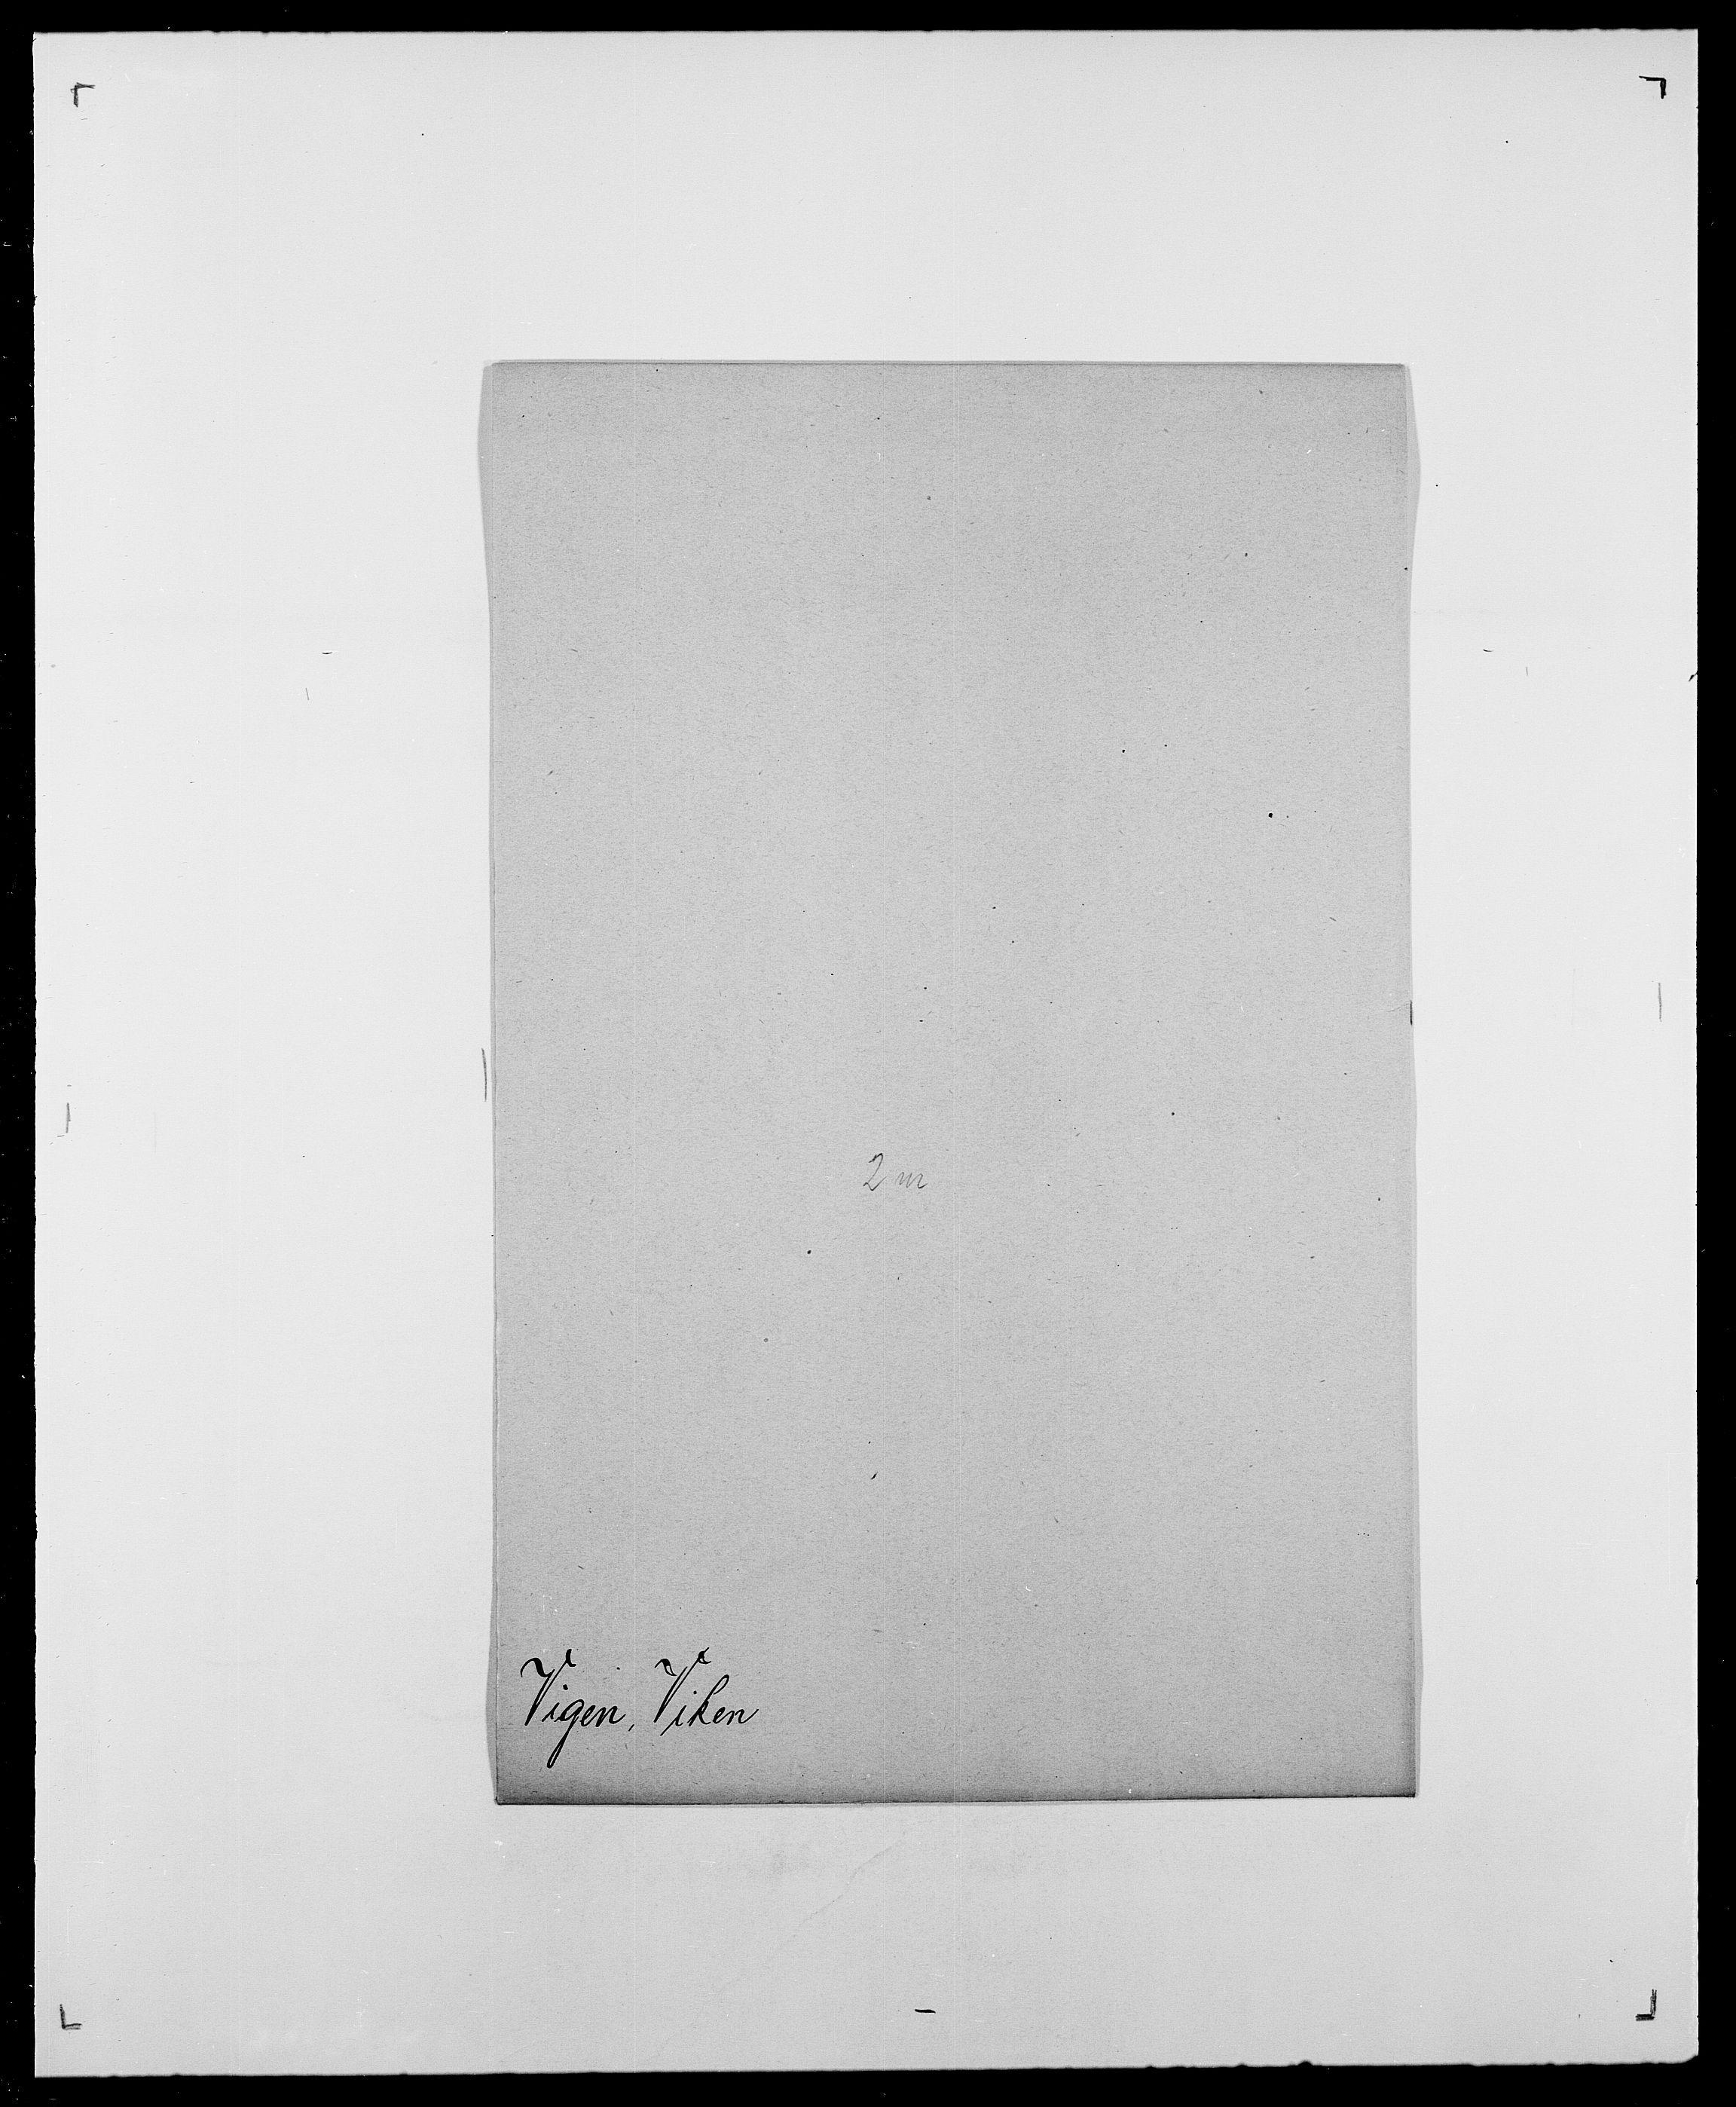 SAO, Delgobe, Charles Antoine - samling, D/Da/L0041: Vemmestad - Viker, s. 688